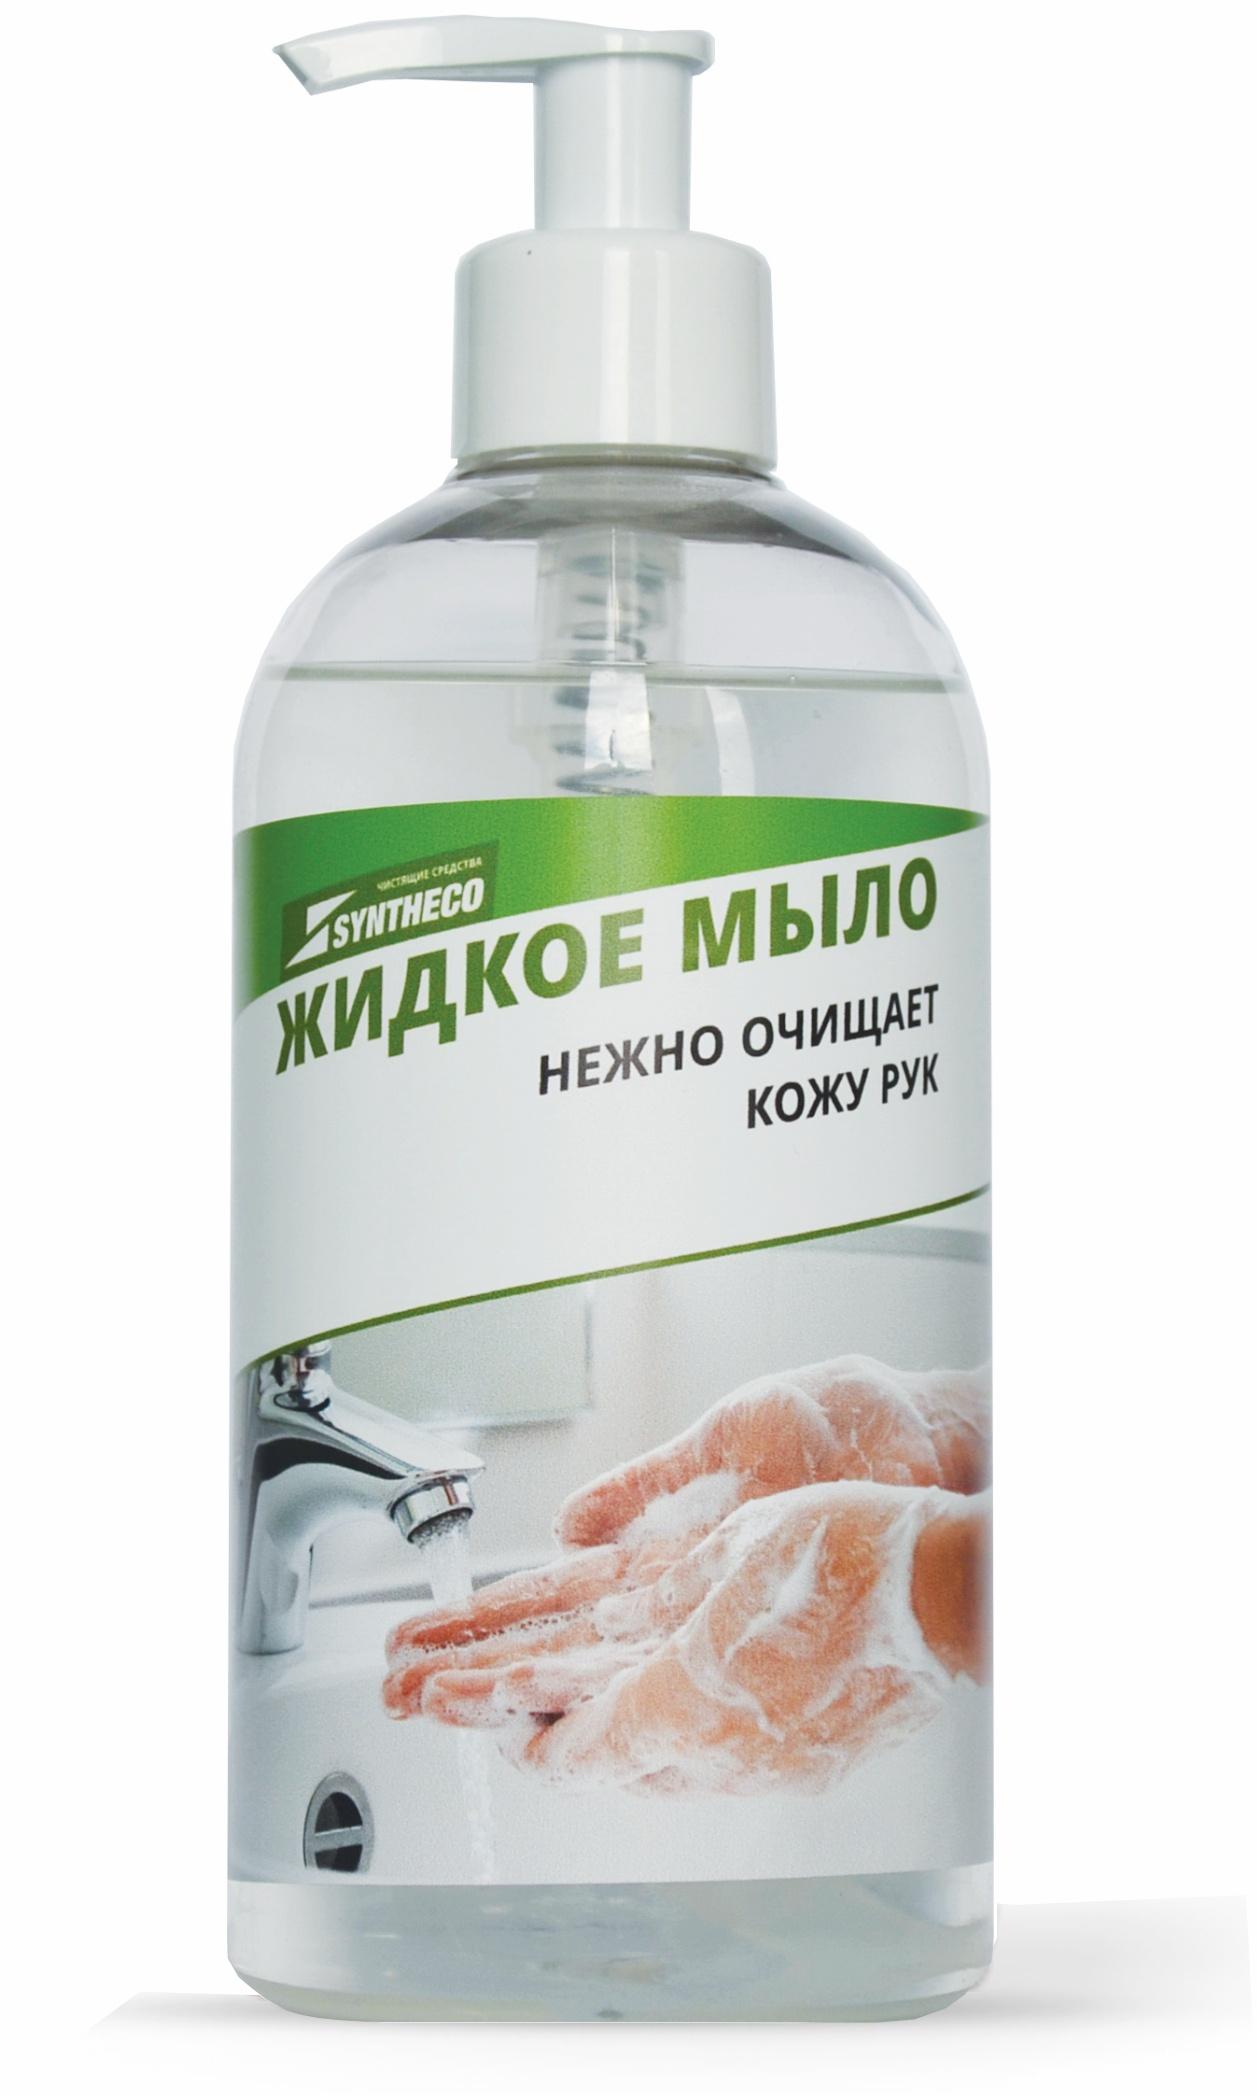 SynthecoЖидкое мыло Без красителей и без ароматизаторов, 0,5 кг Syntheco